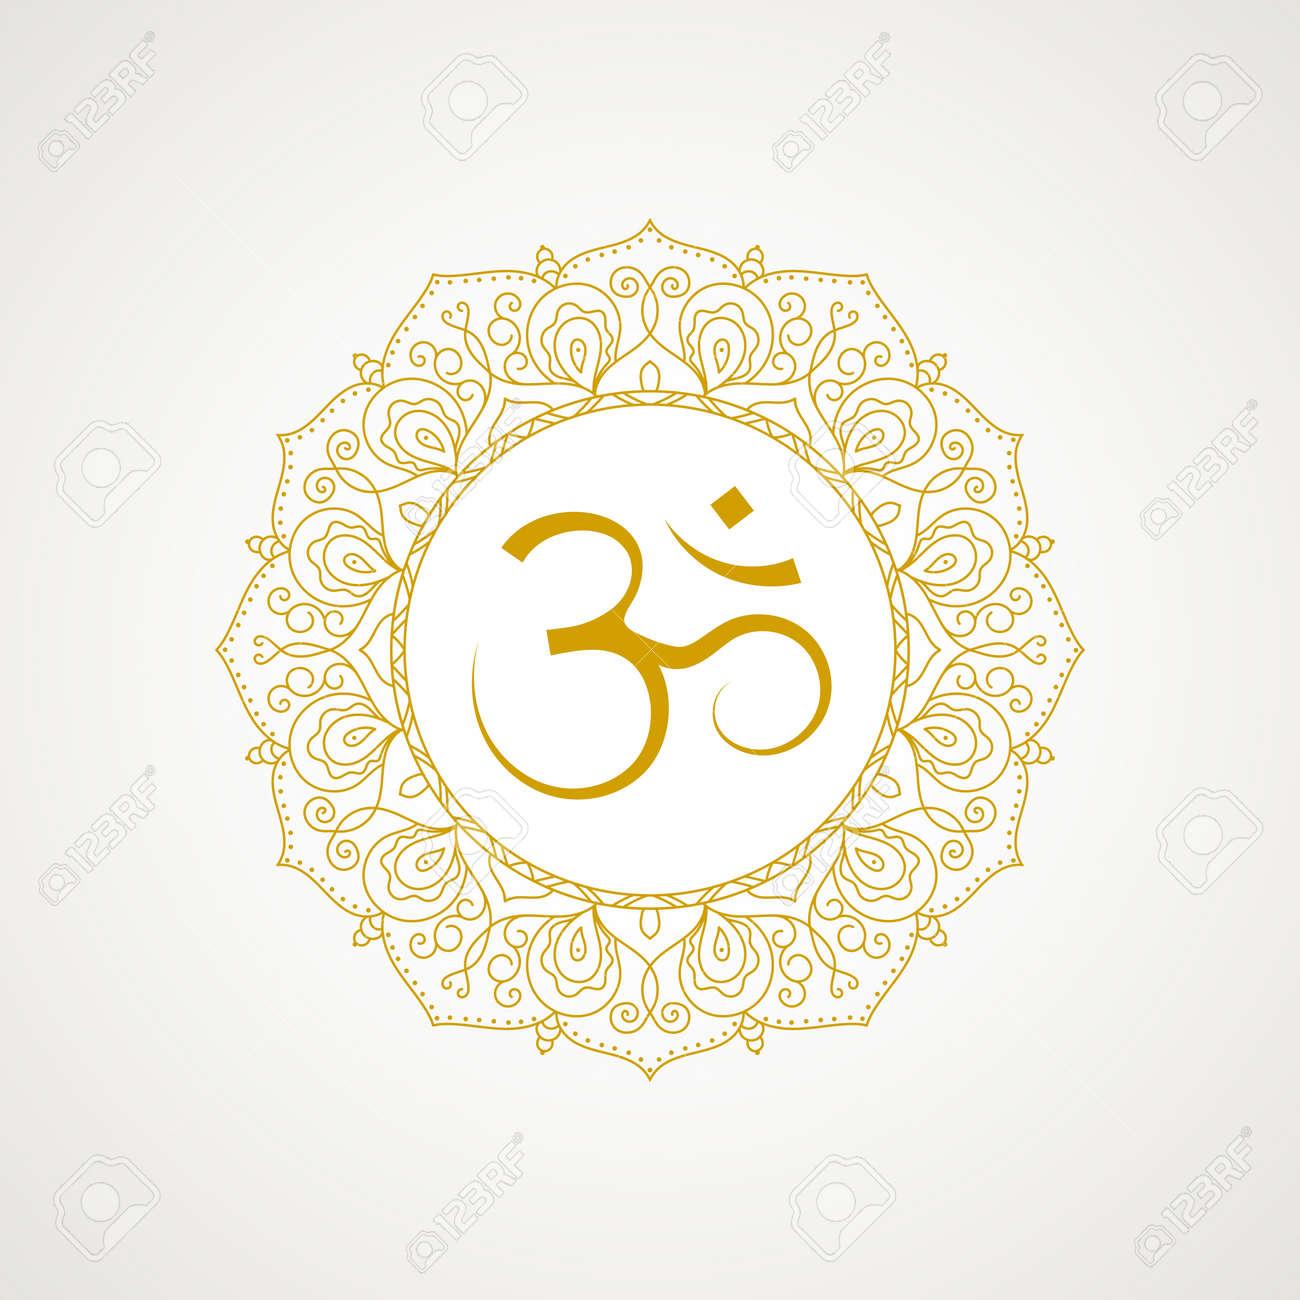 Golden om symbol  Gold lace frame  isolated on white background